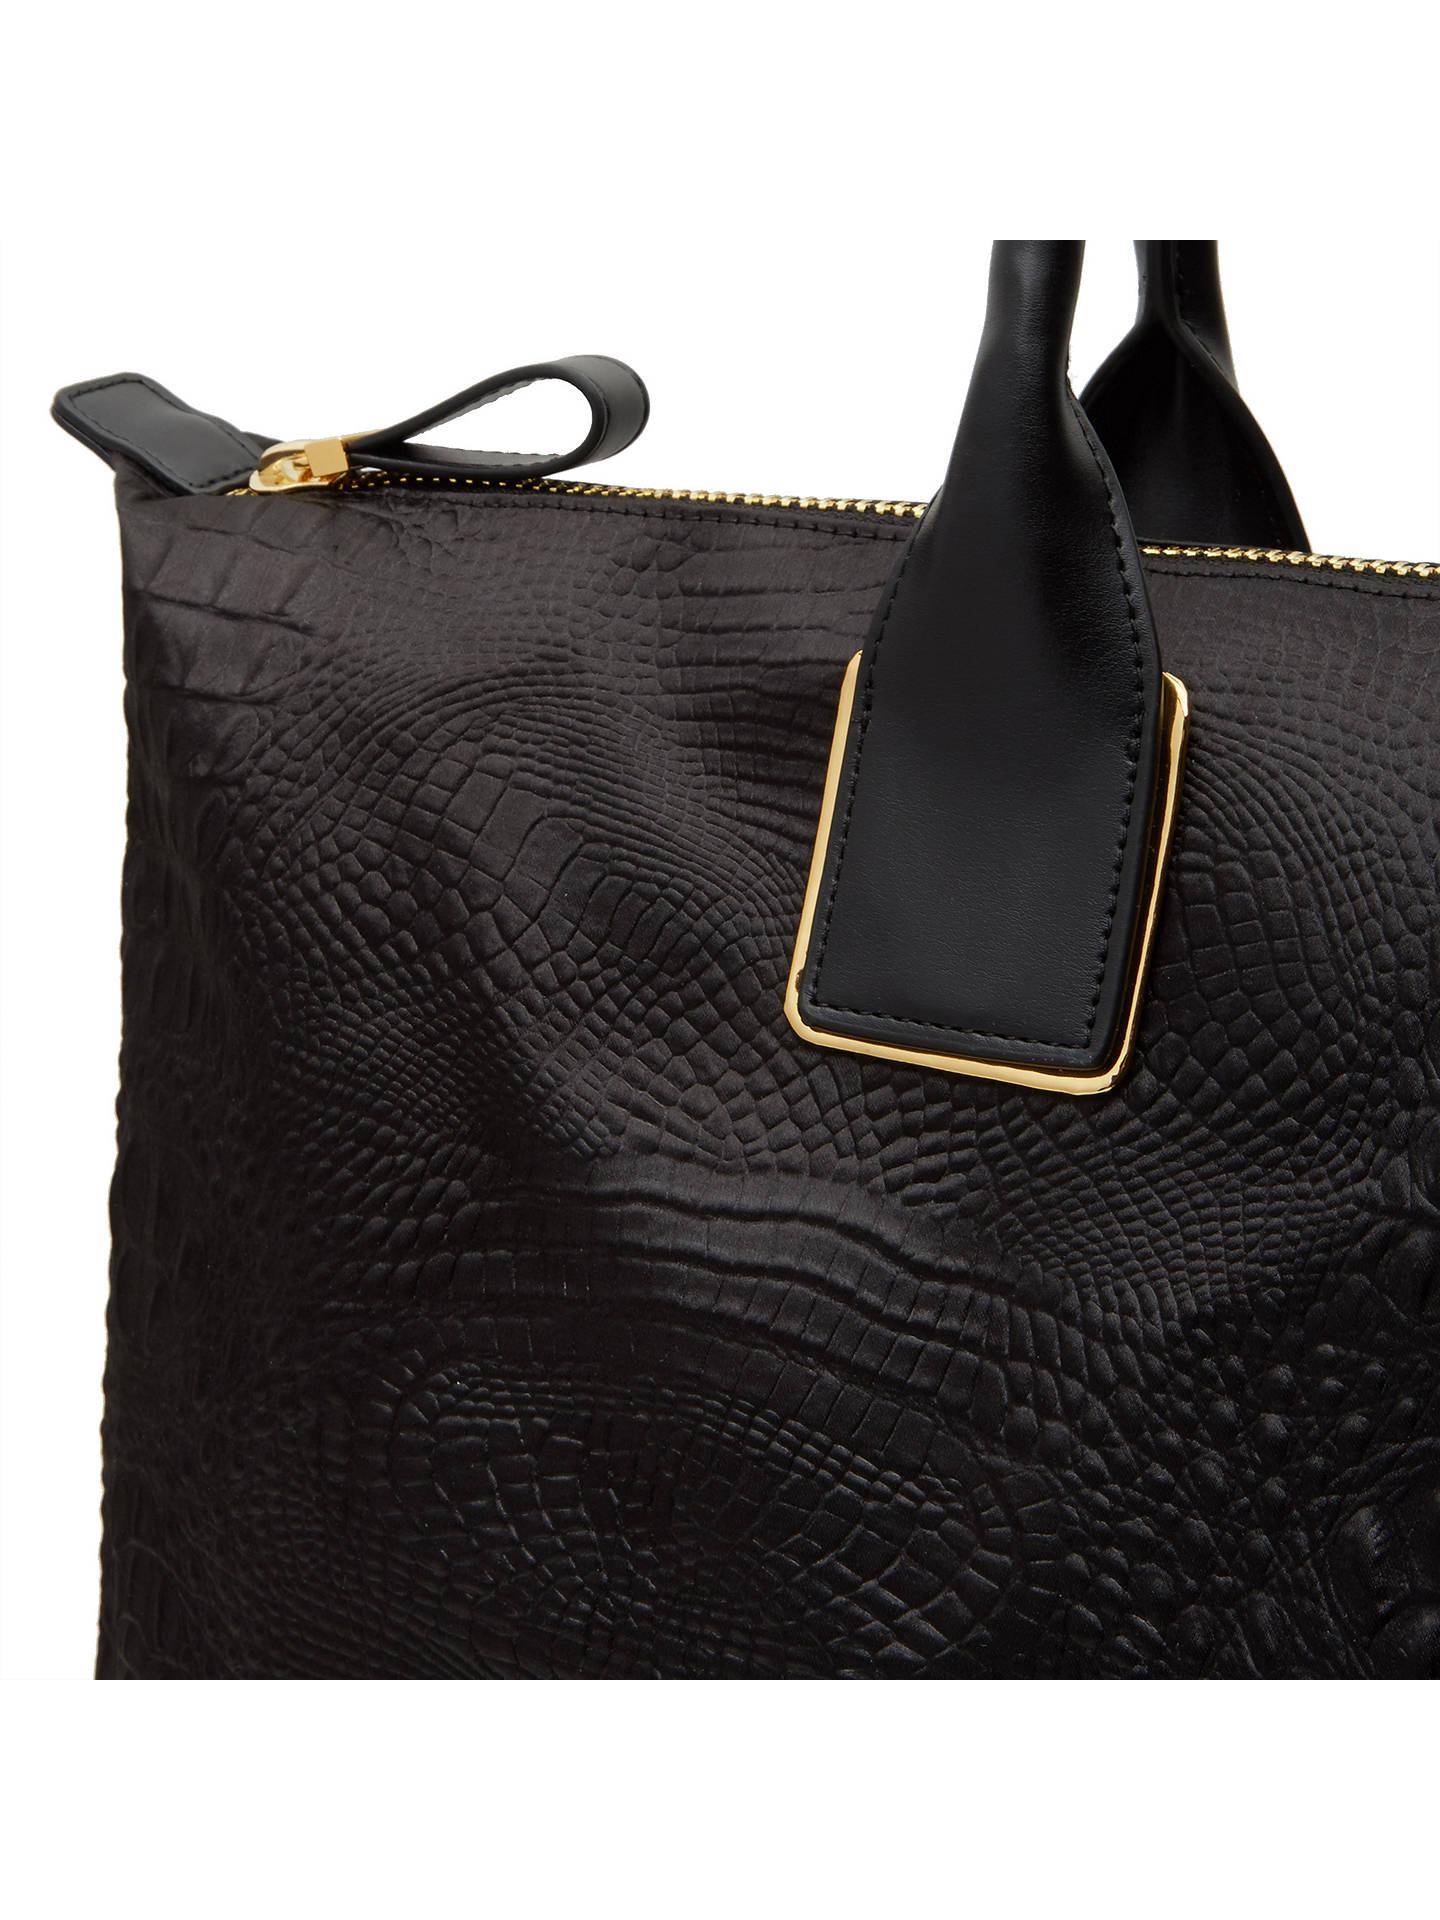 a30b7cf7d48bce ... Buy Ted Baker Tori Exotic Large Tote Bag